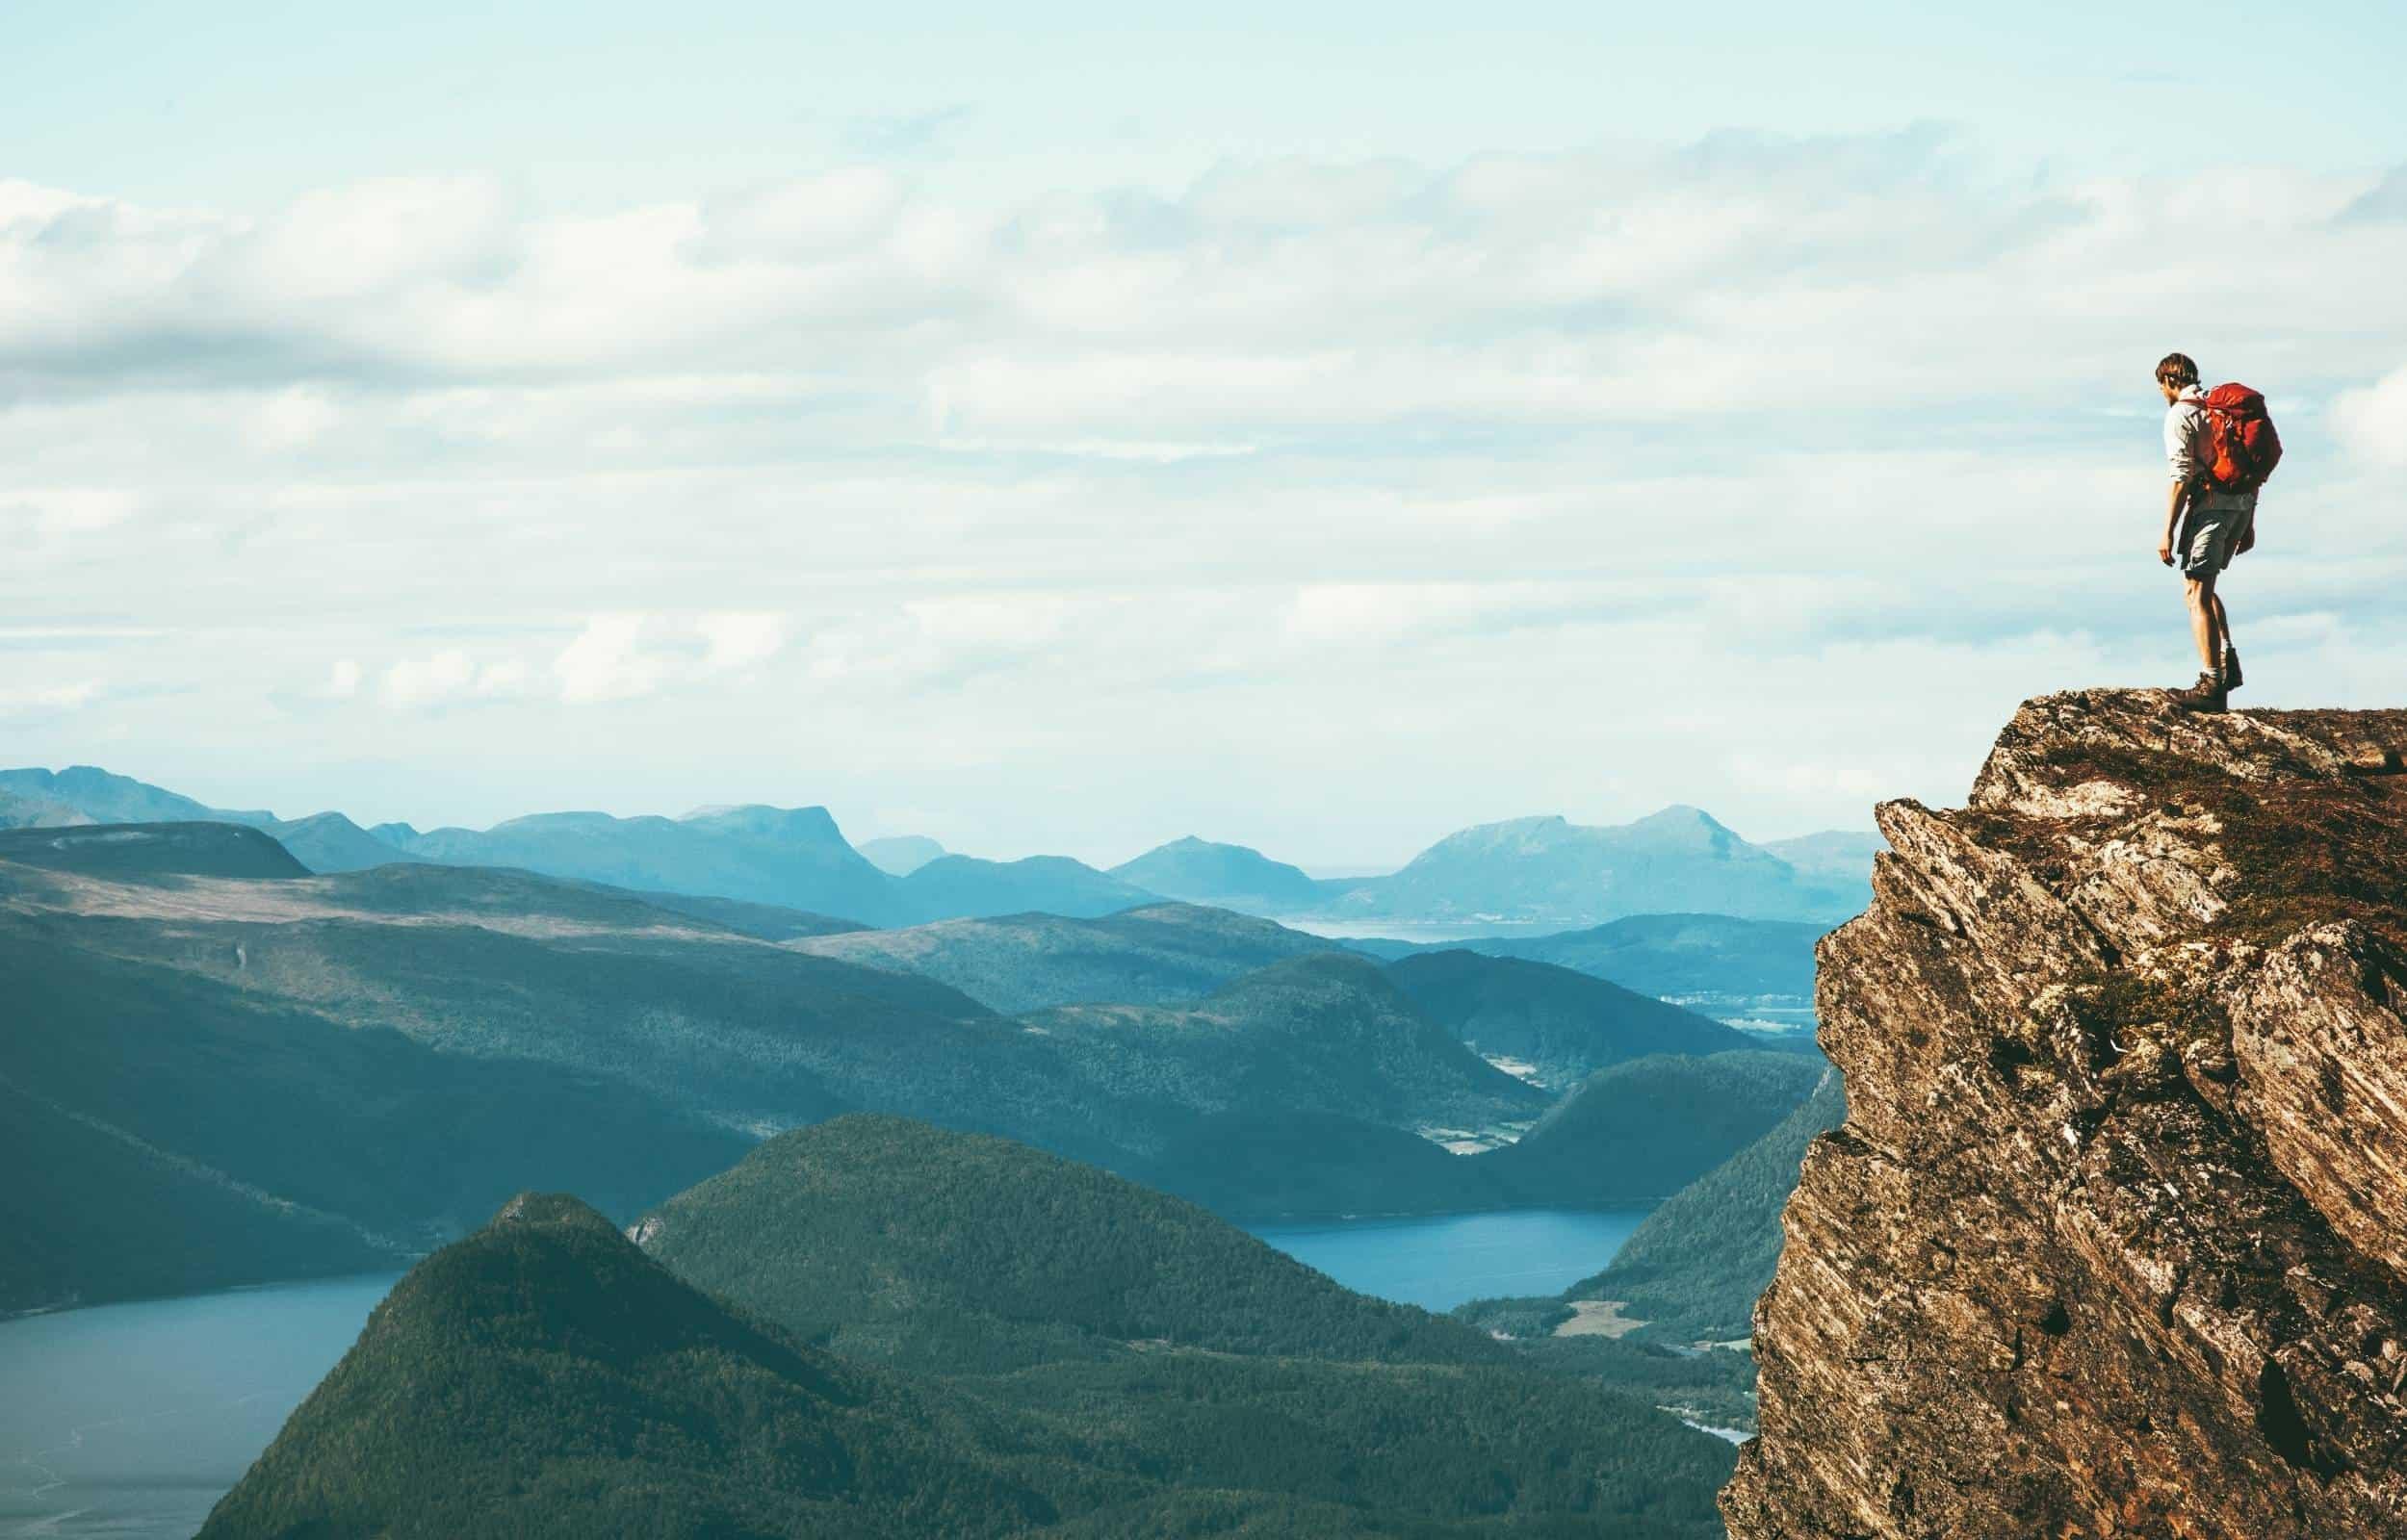 osprey backpack hiking mountain